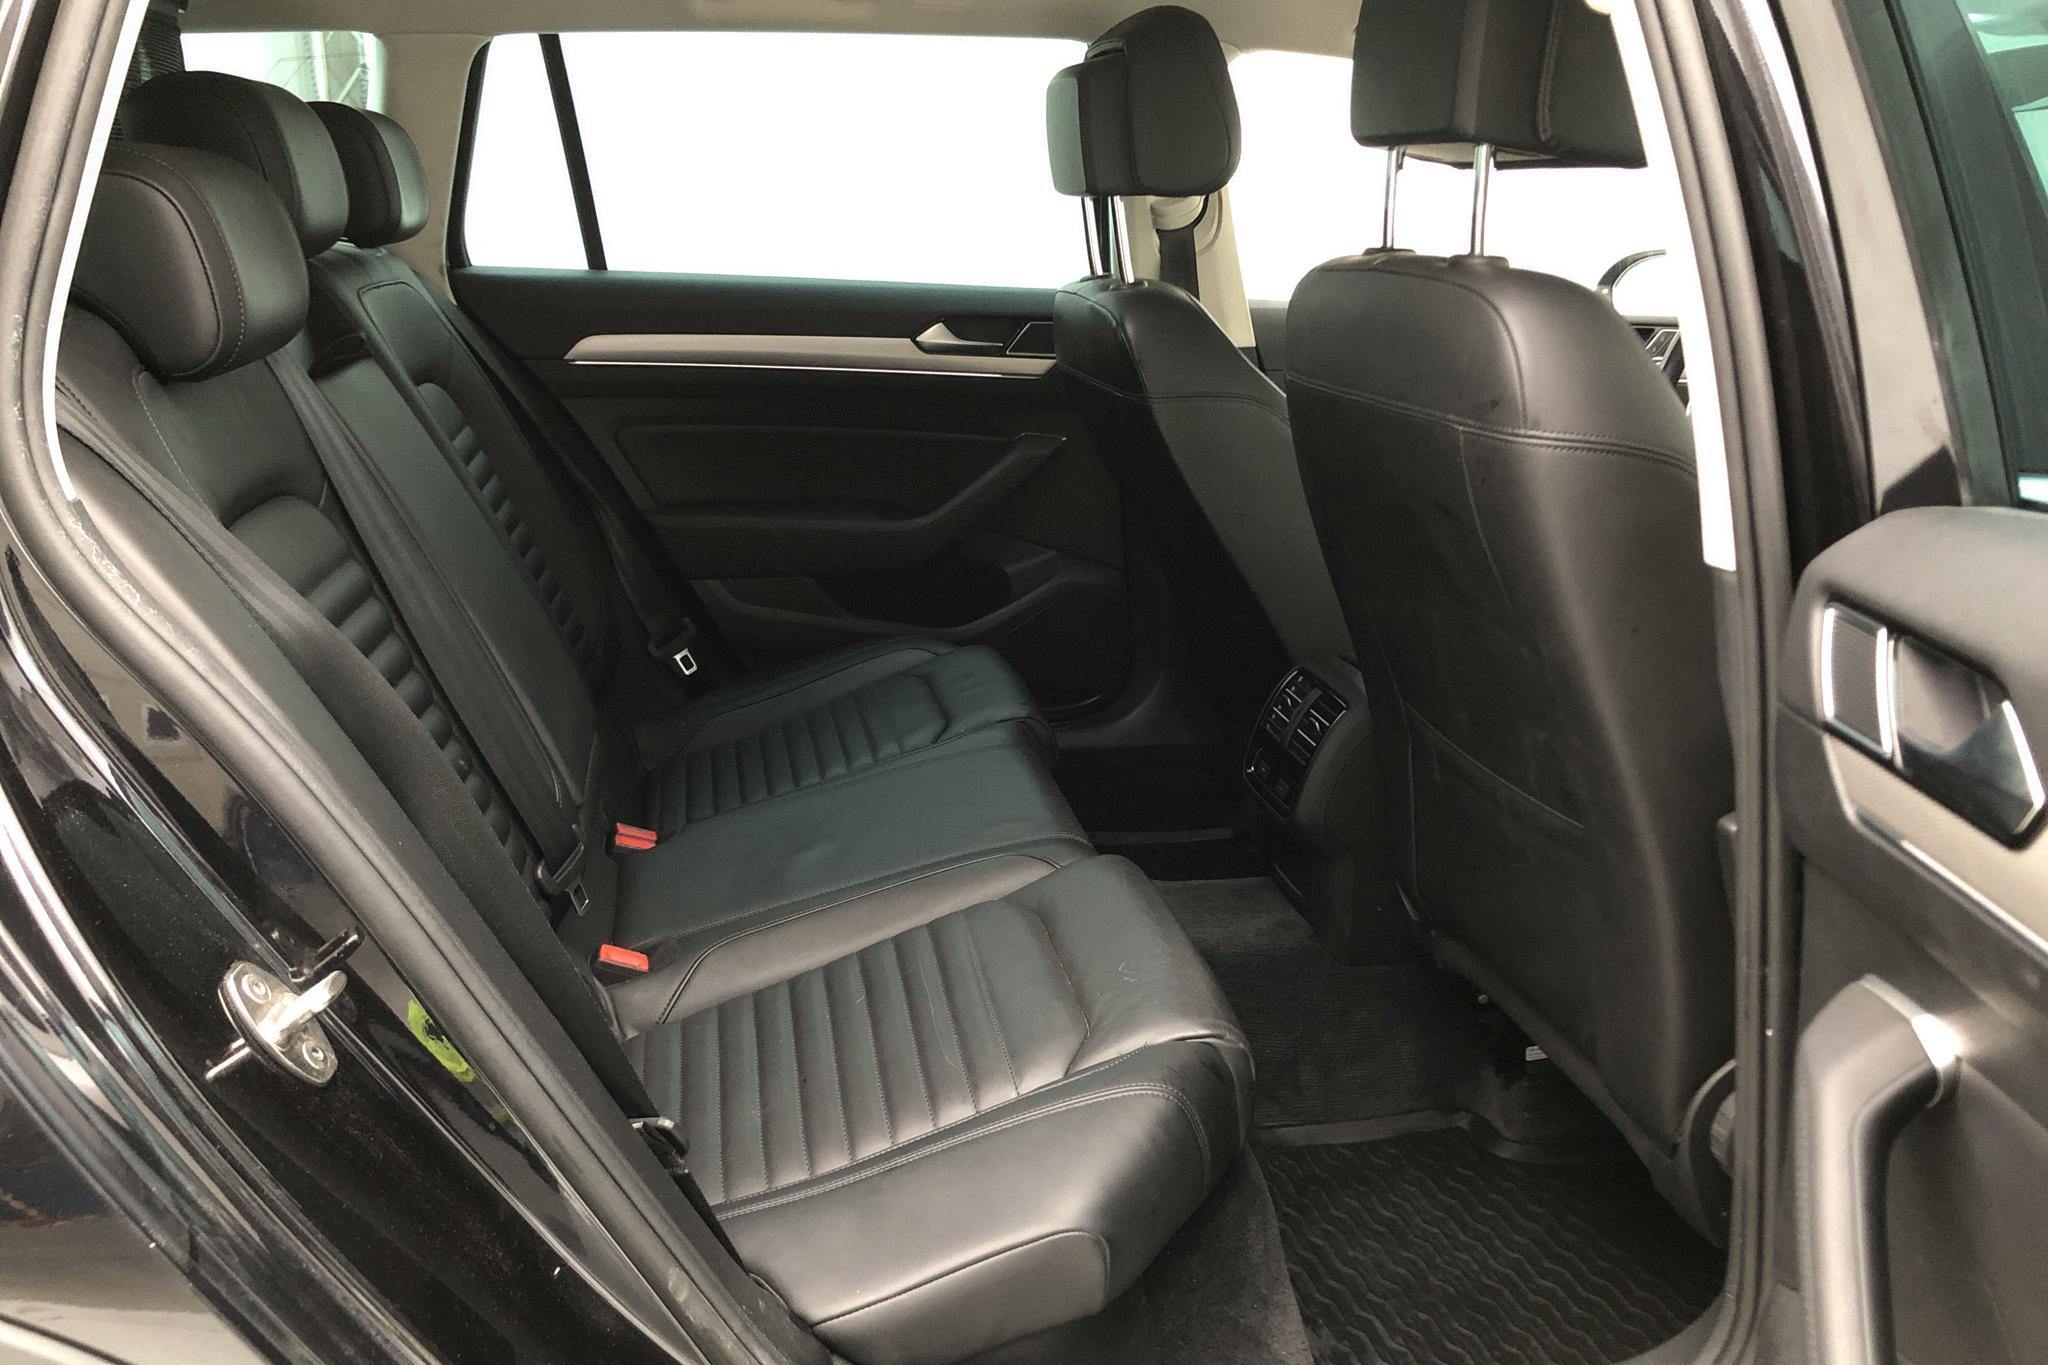 VW Passat Alltrack 2.0 TDI Sportscombi 4MOTION (190hk) - 0 mil - Automat - svart - 2016